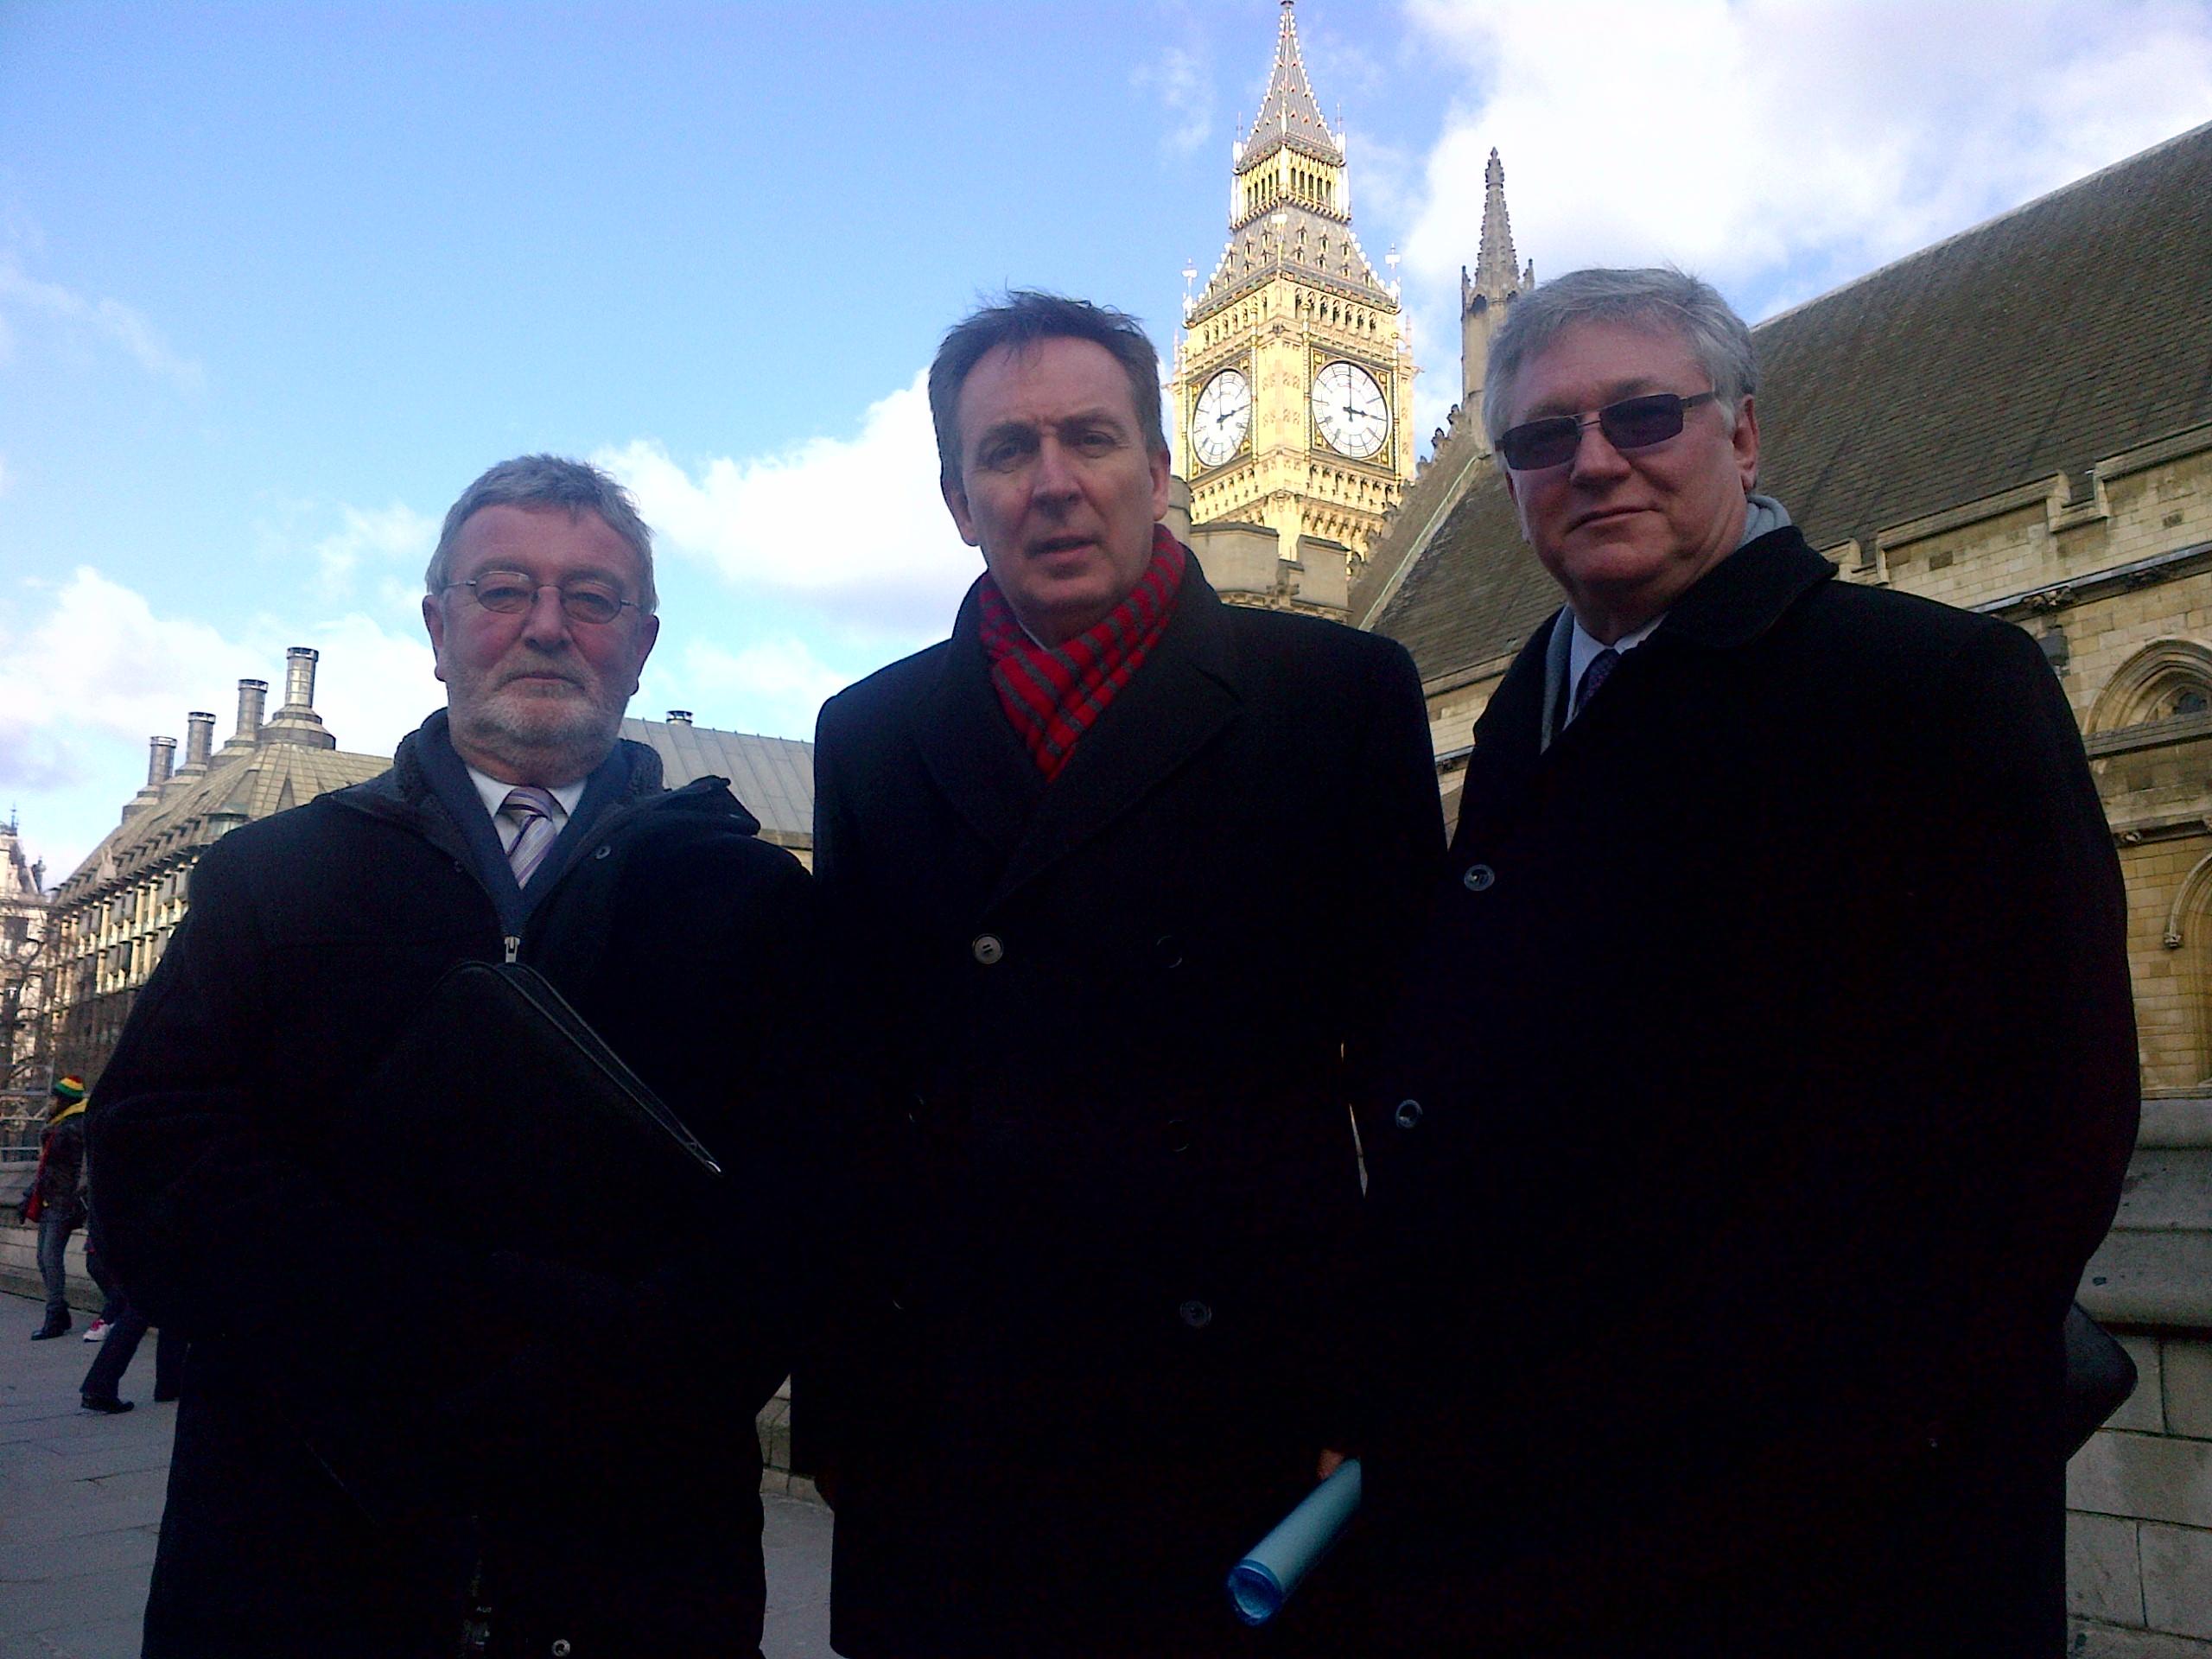 Westminster-20130312-00125.jpg